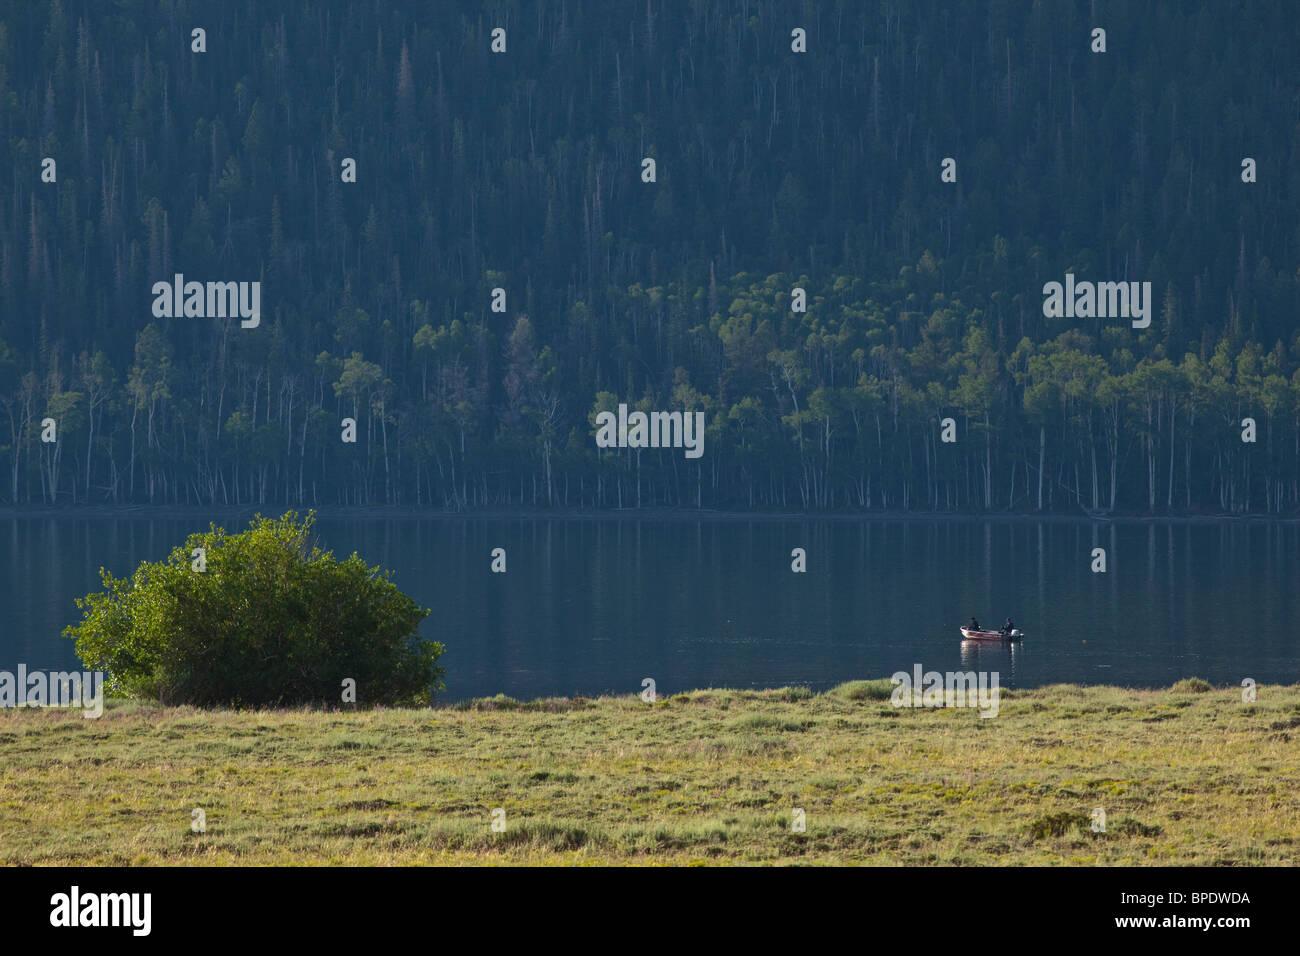 I pescatori in barca sul pesce di lago, ancora mattina a Fishlake National Forest, Utah, Stati Uniti d'America Immagini Stock